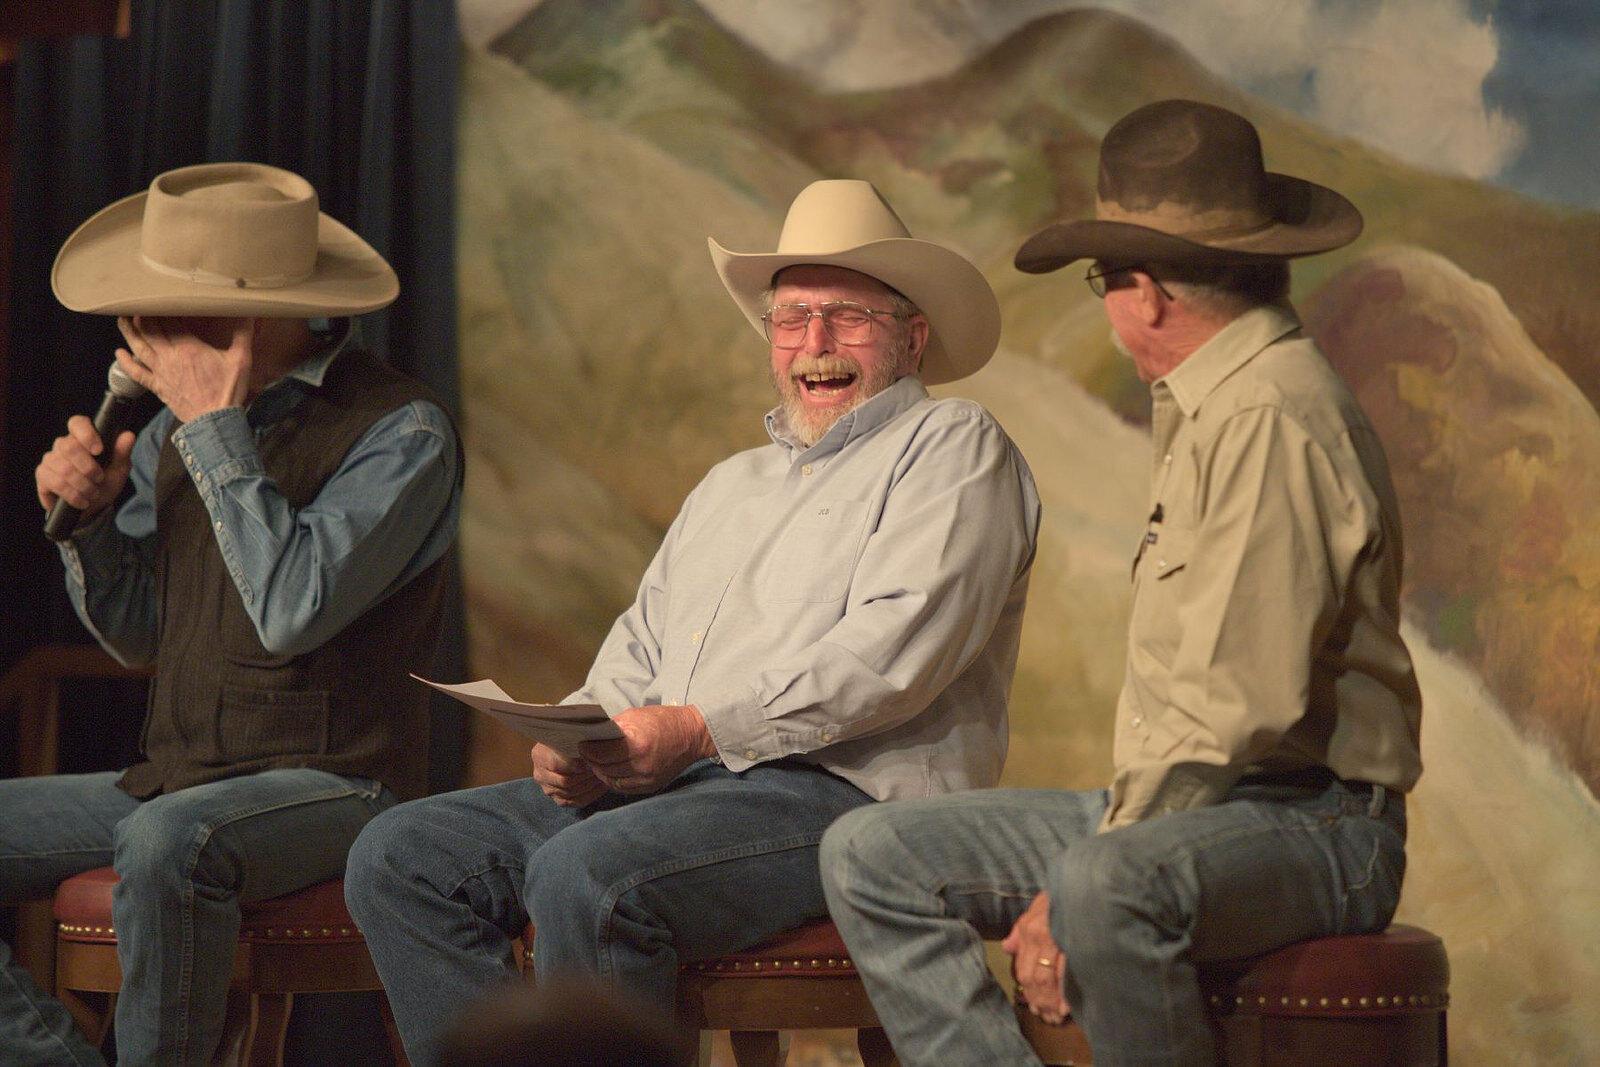 Poets Randy Rieman, John Dofflemyer and Joel Nelson, photo by Charlie Ekburg